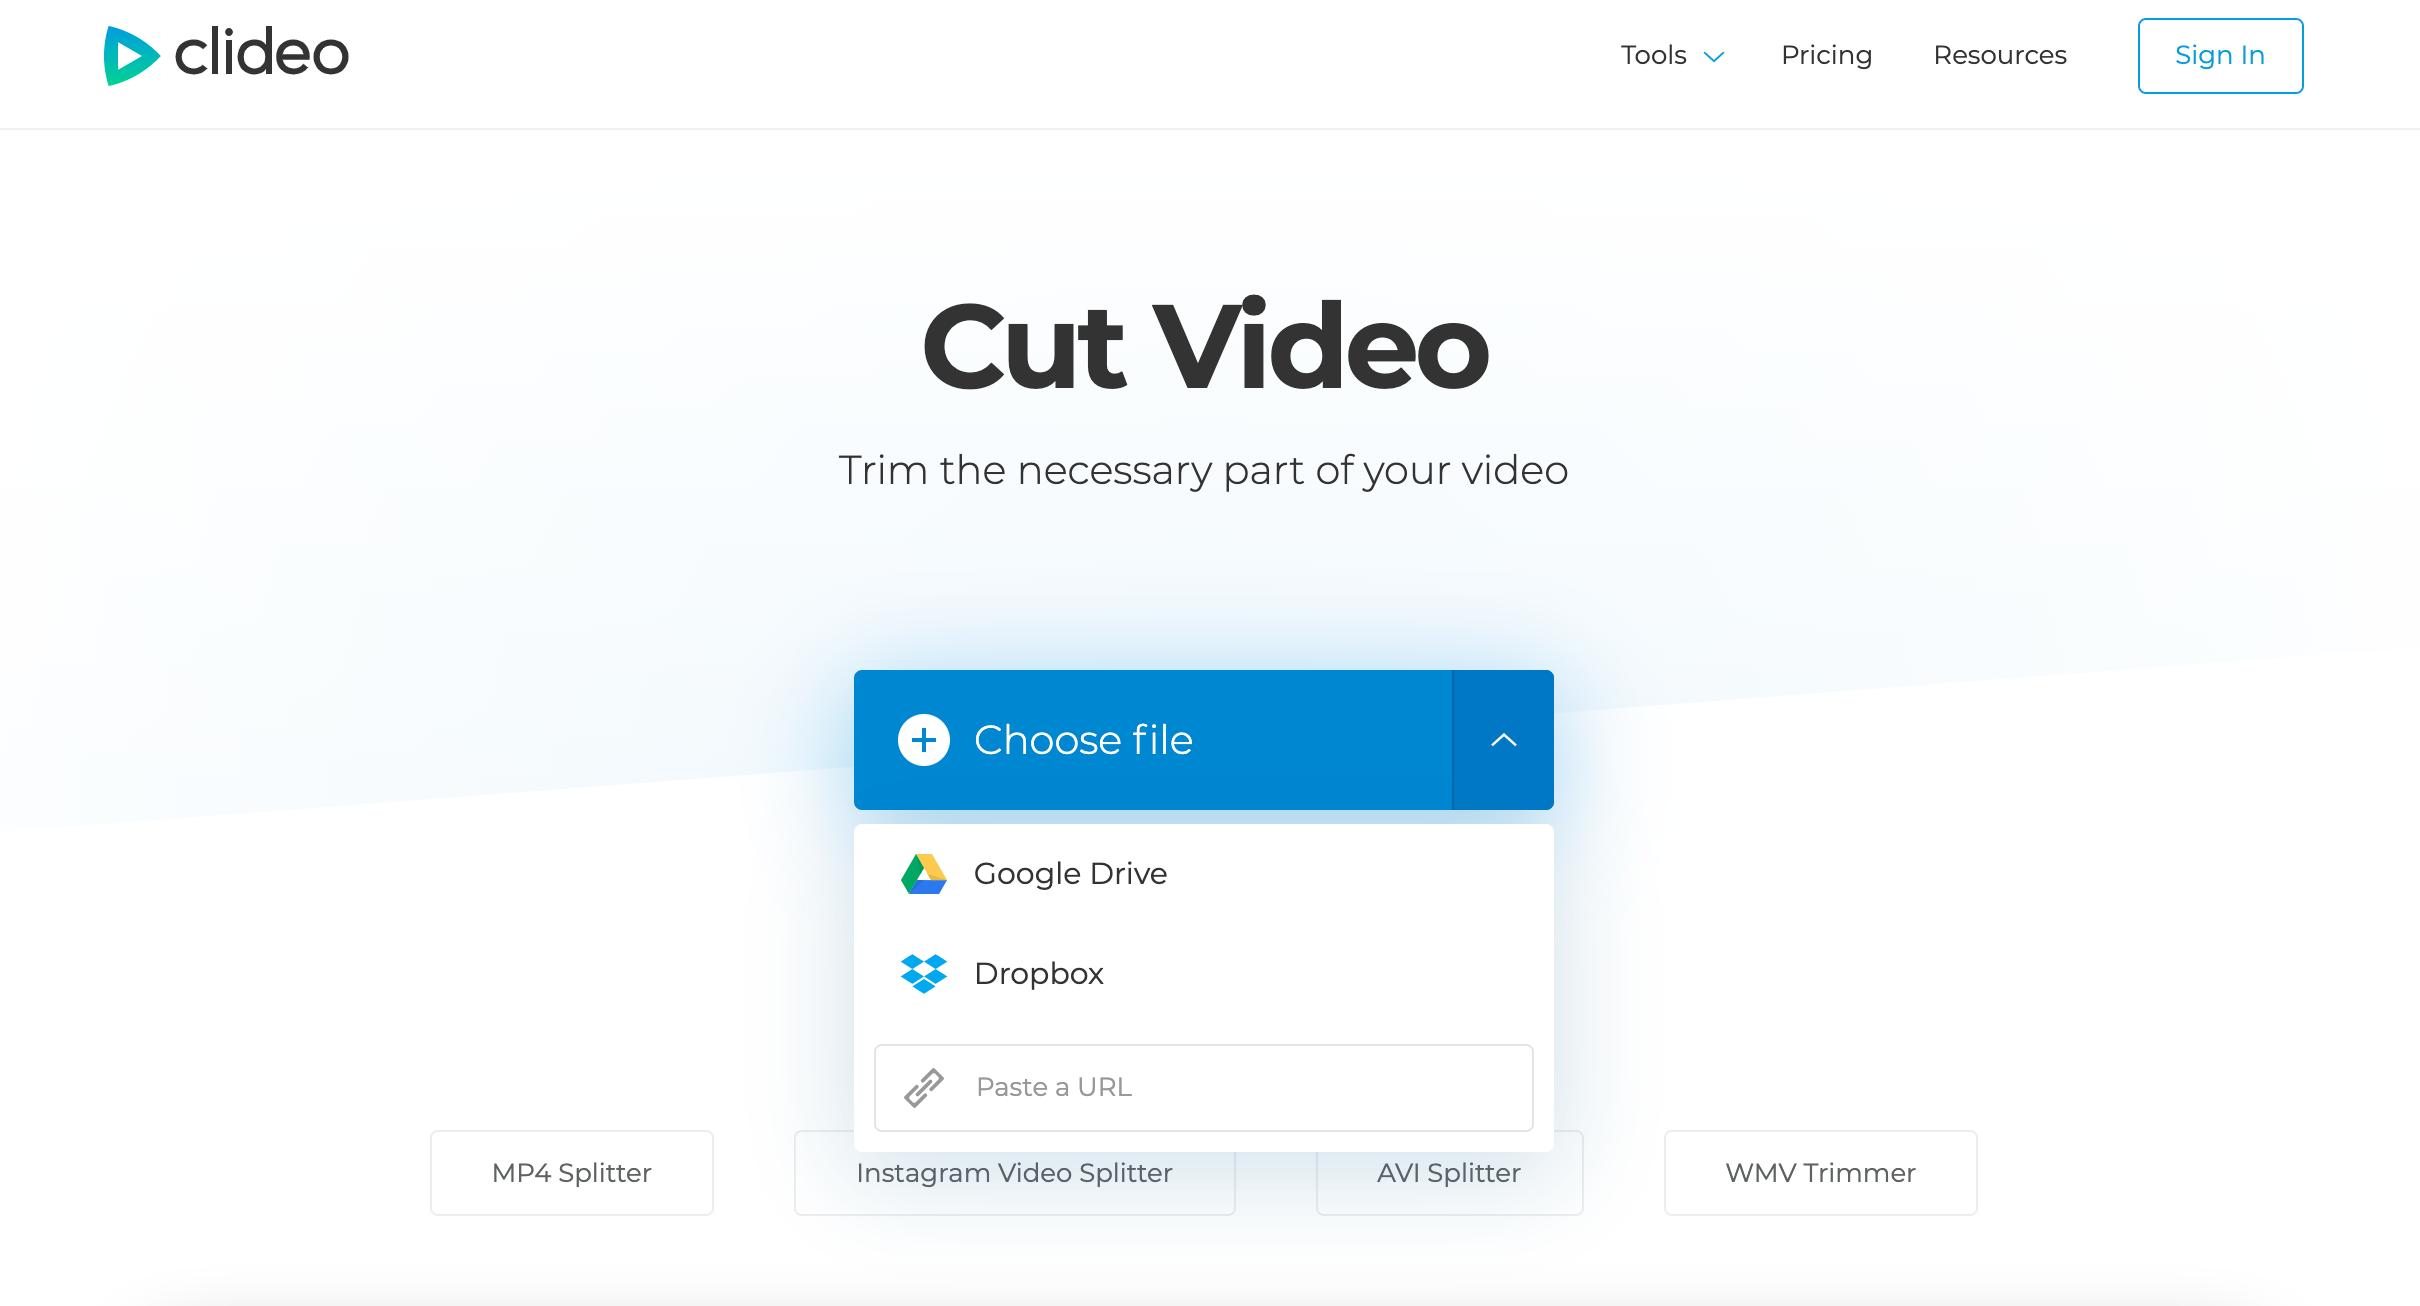 Upload an AVI file to cut